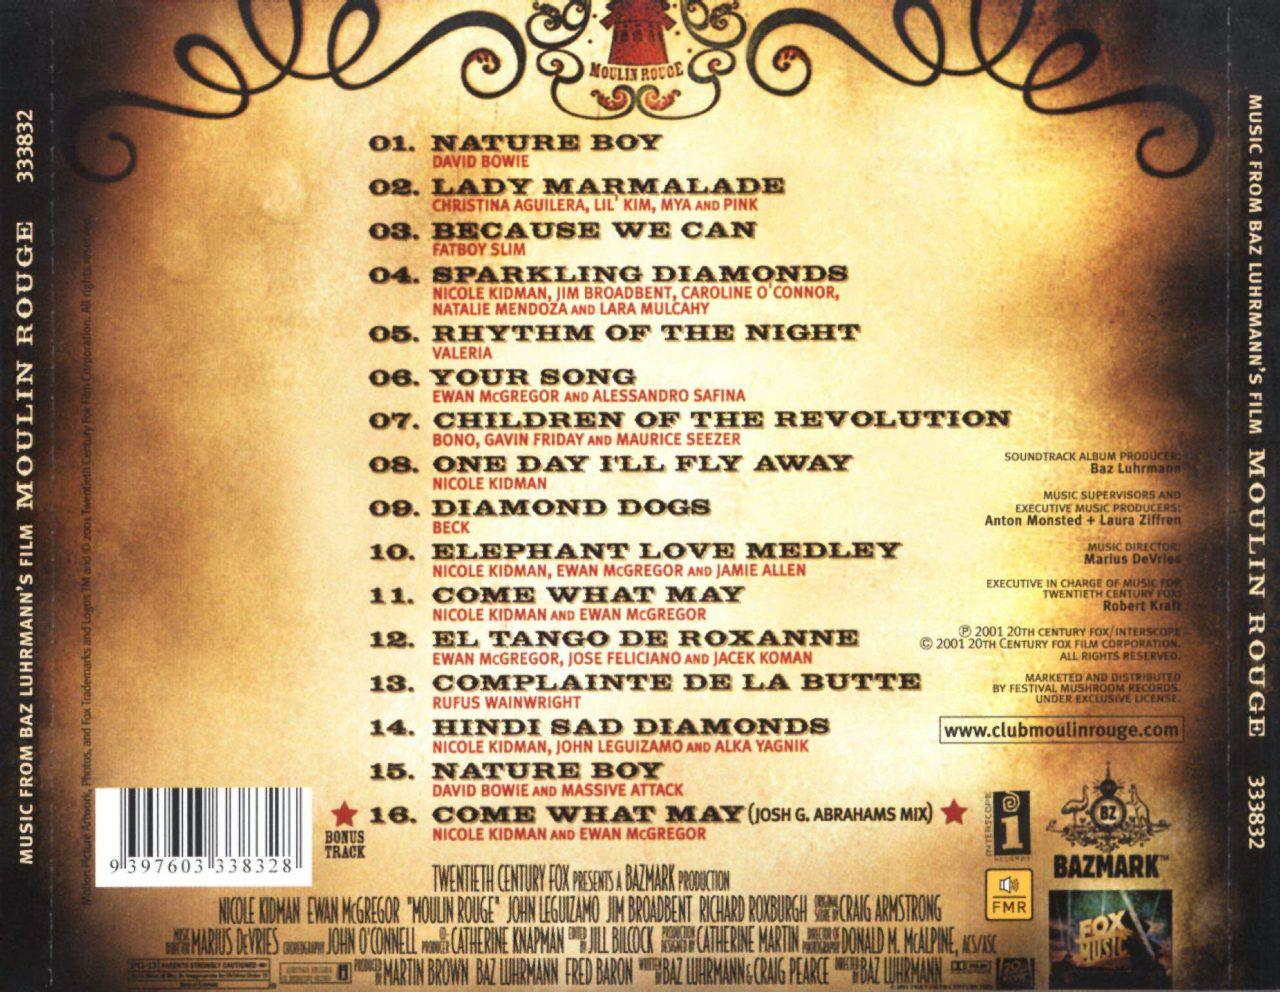 http://1.bp.blogspot.com/_xhkTUMhe_Qo/TNw_8sFOqOI/AAAAAAAABEs/IwZt6UgQjzI/s1600/Soundtrack_-_Moulin_Rouge-back.jpg